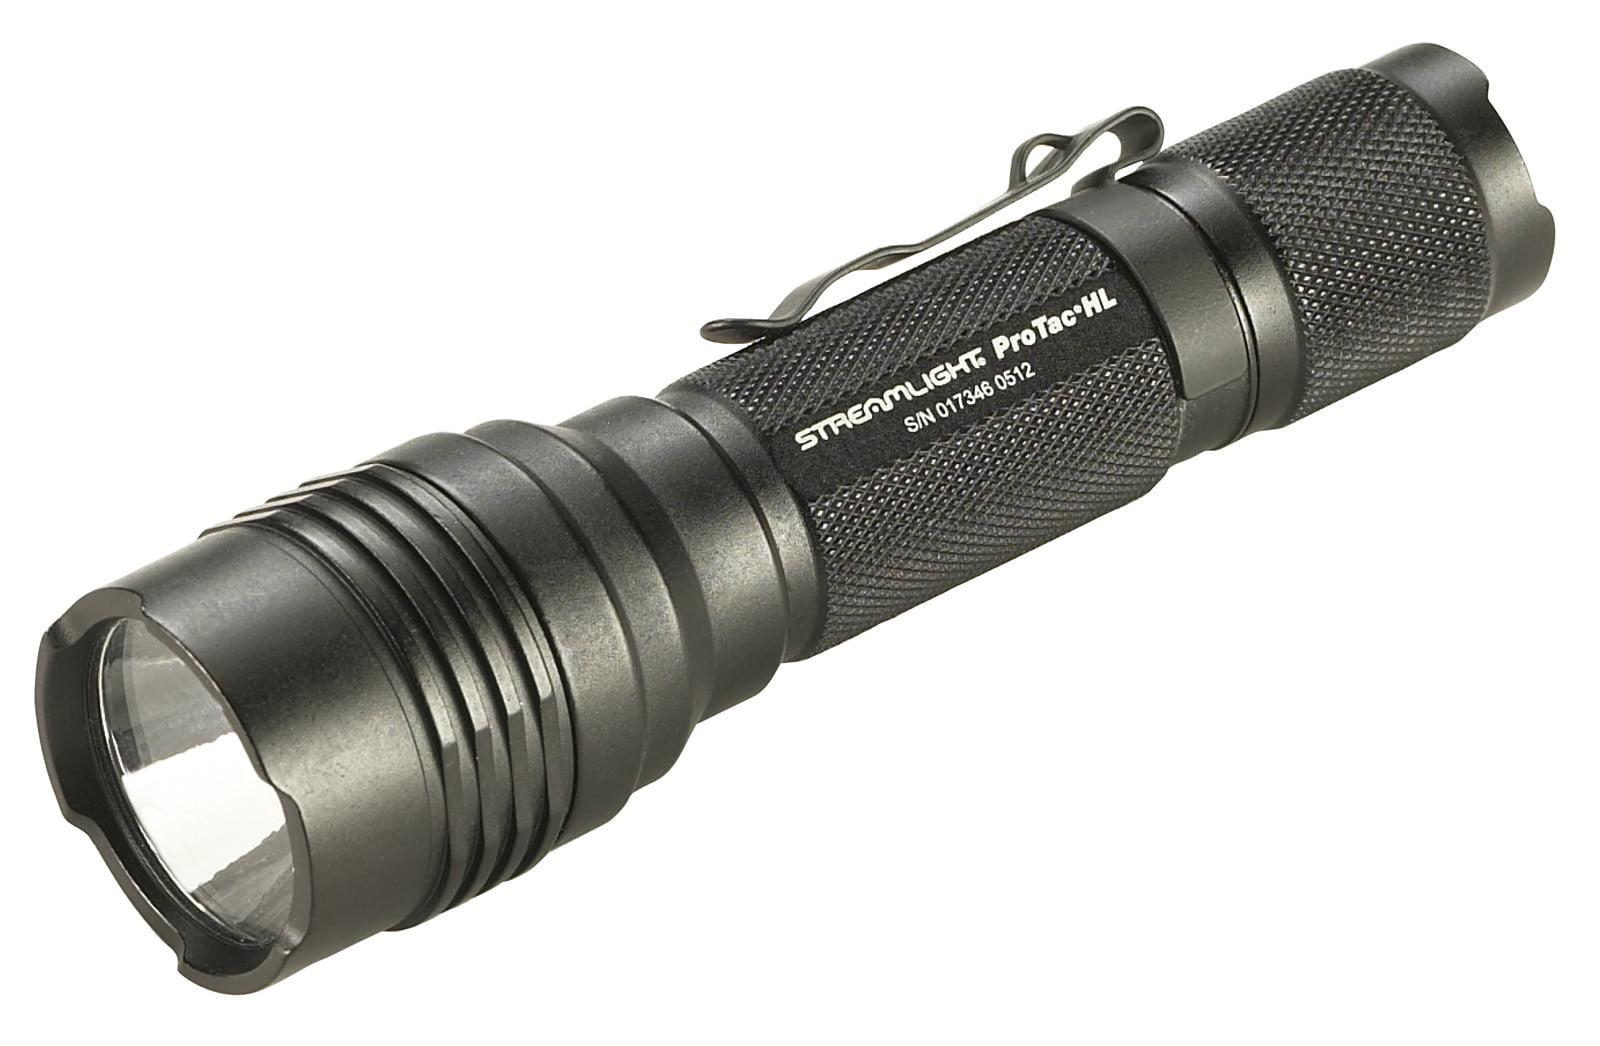 Streamlight ProTac HL, 750 Lumen Professional Tactical Light by Streamlight